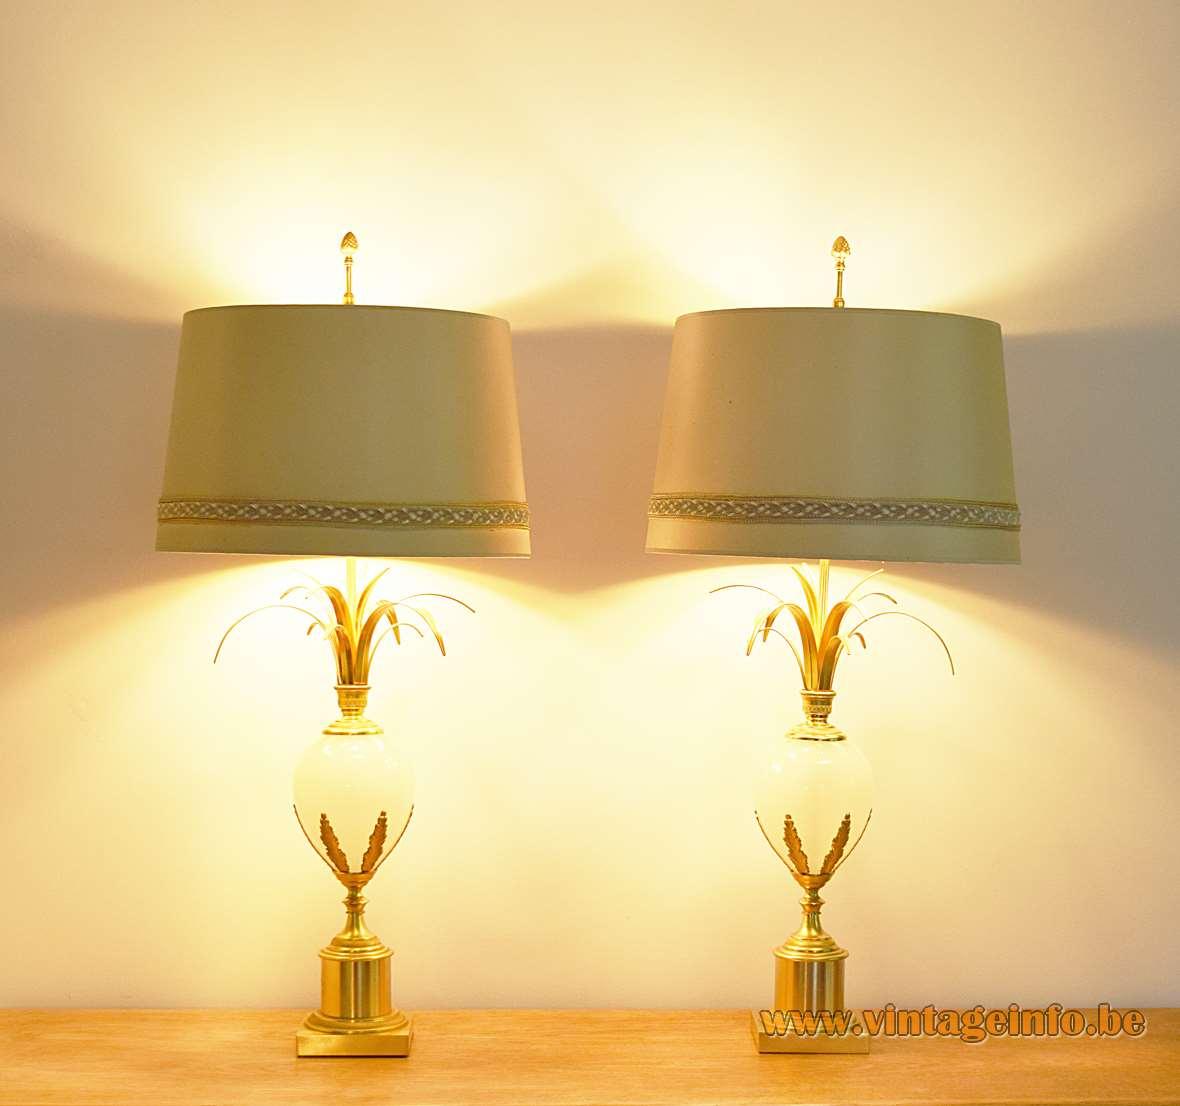 Boulanger ostrich egg table lamps brass base opal glass globe palm leaves reed 1960s 1970s Hollywood Regency